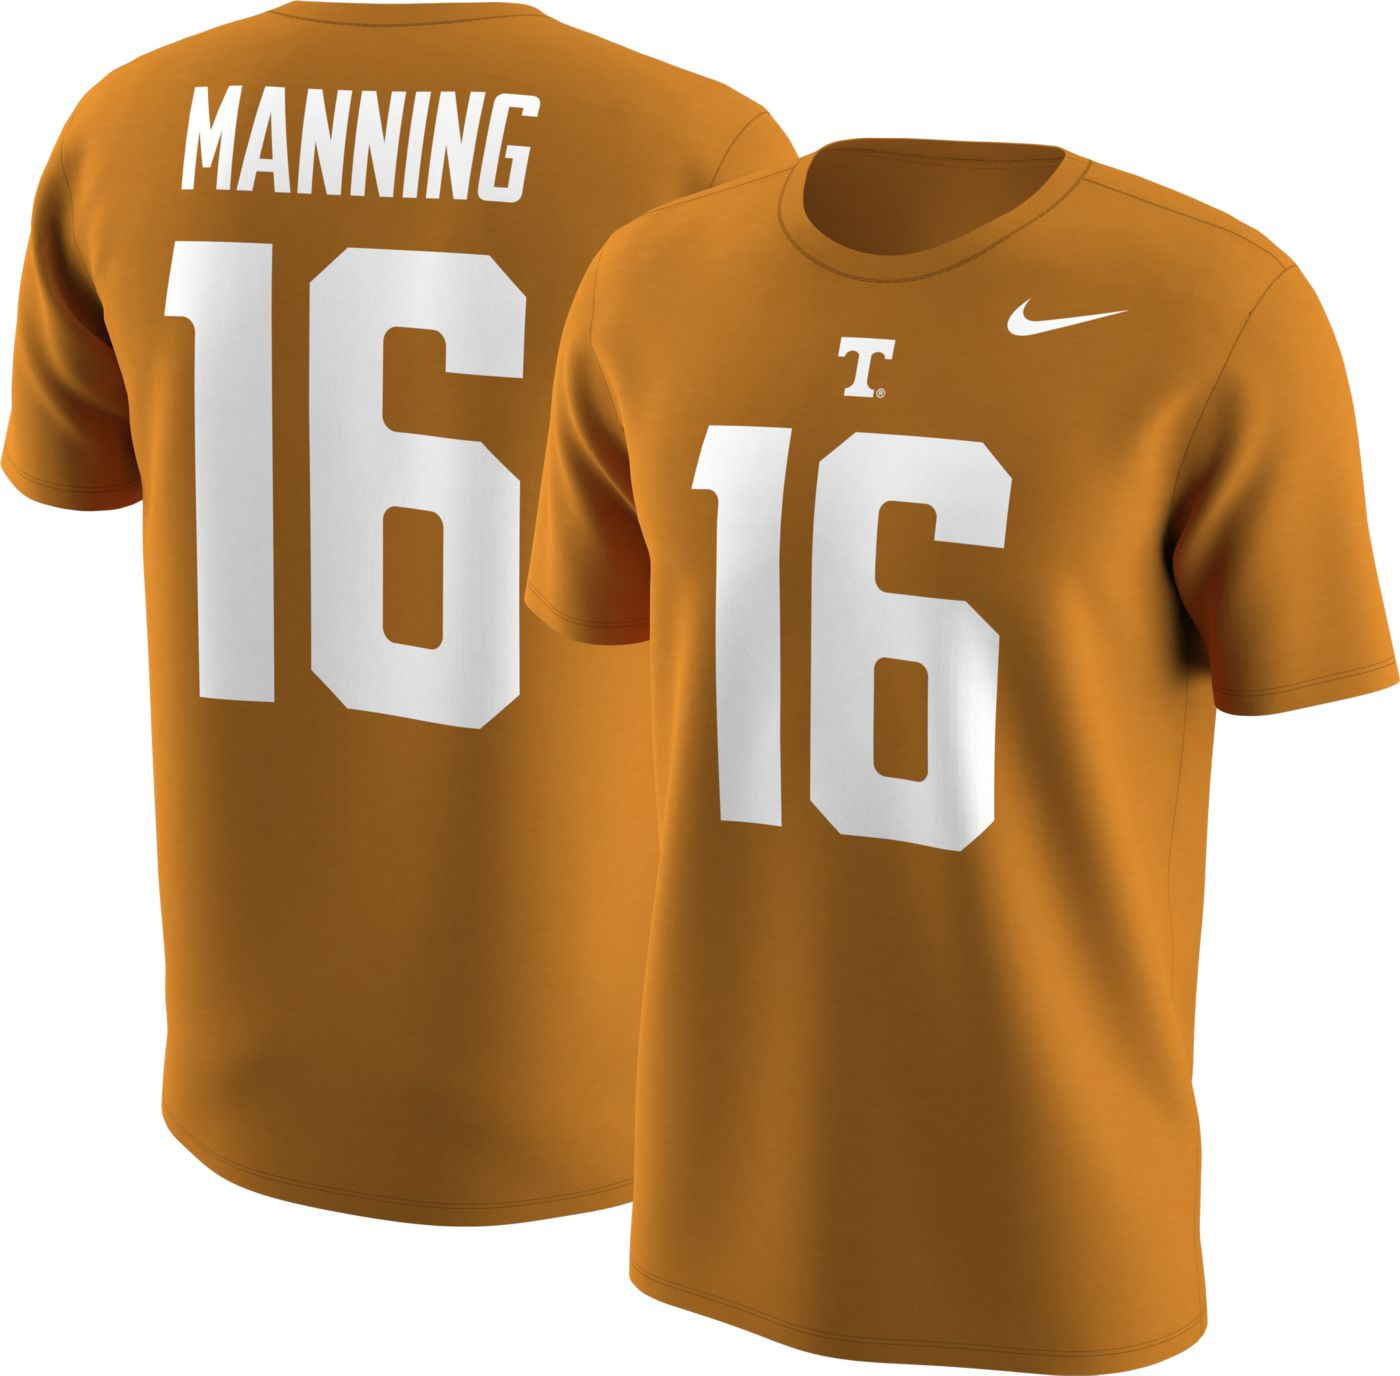 Nike Men's Tennessee Volunteers Peyton Manning #16 Tennessee Orange Football Jersey T-Shirt